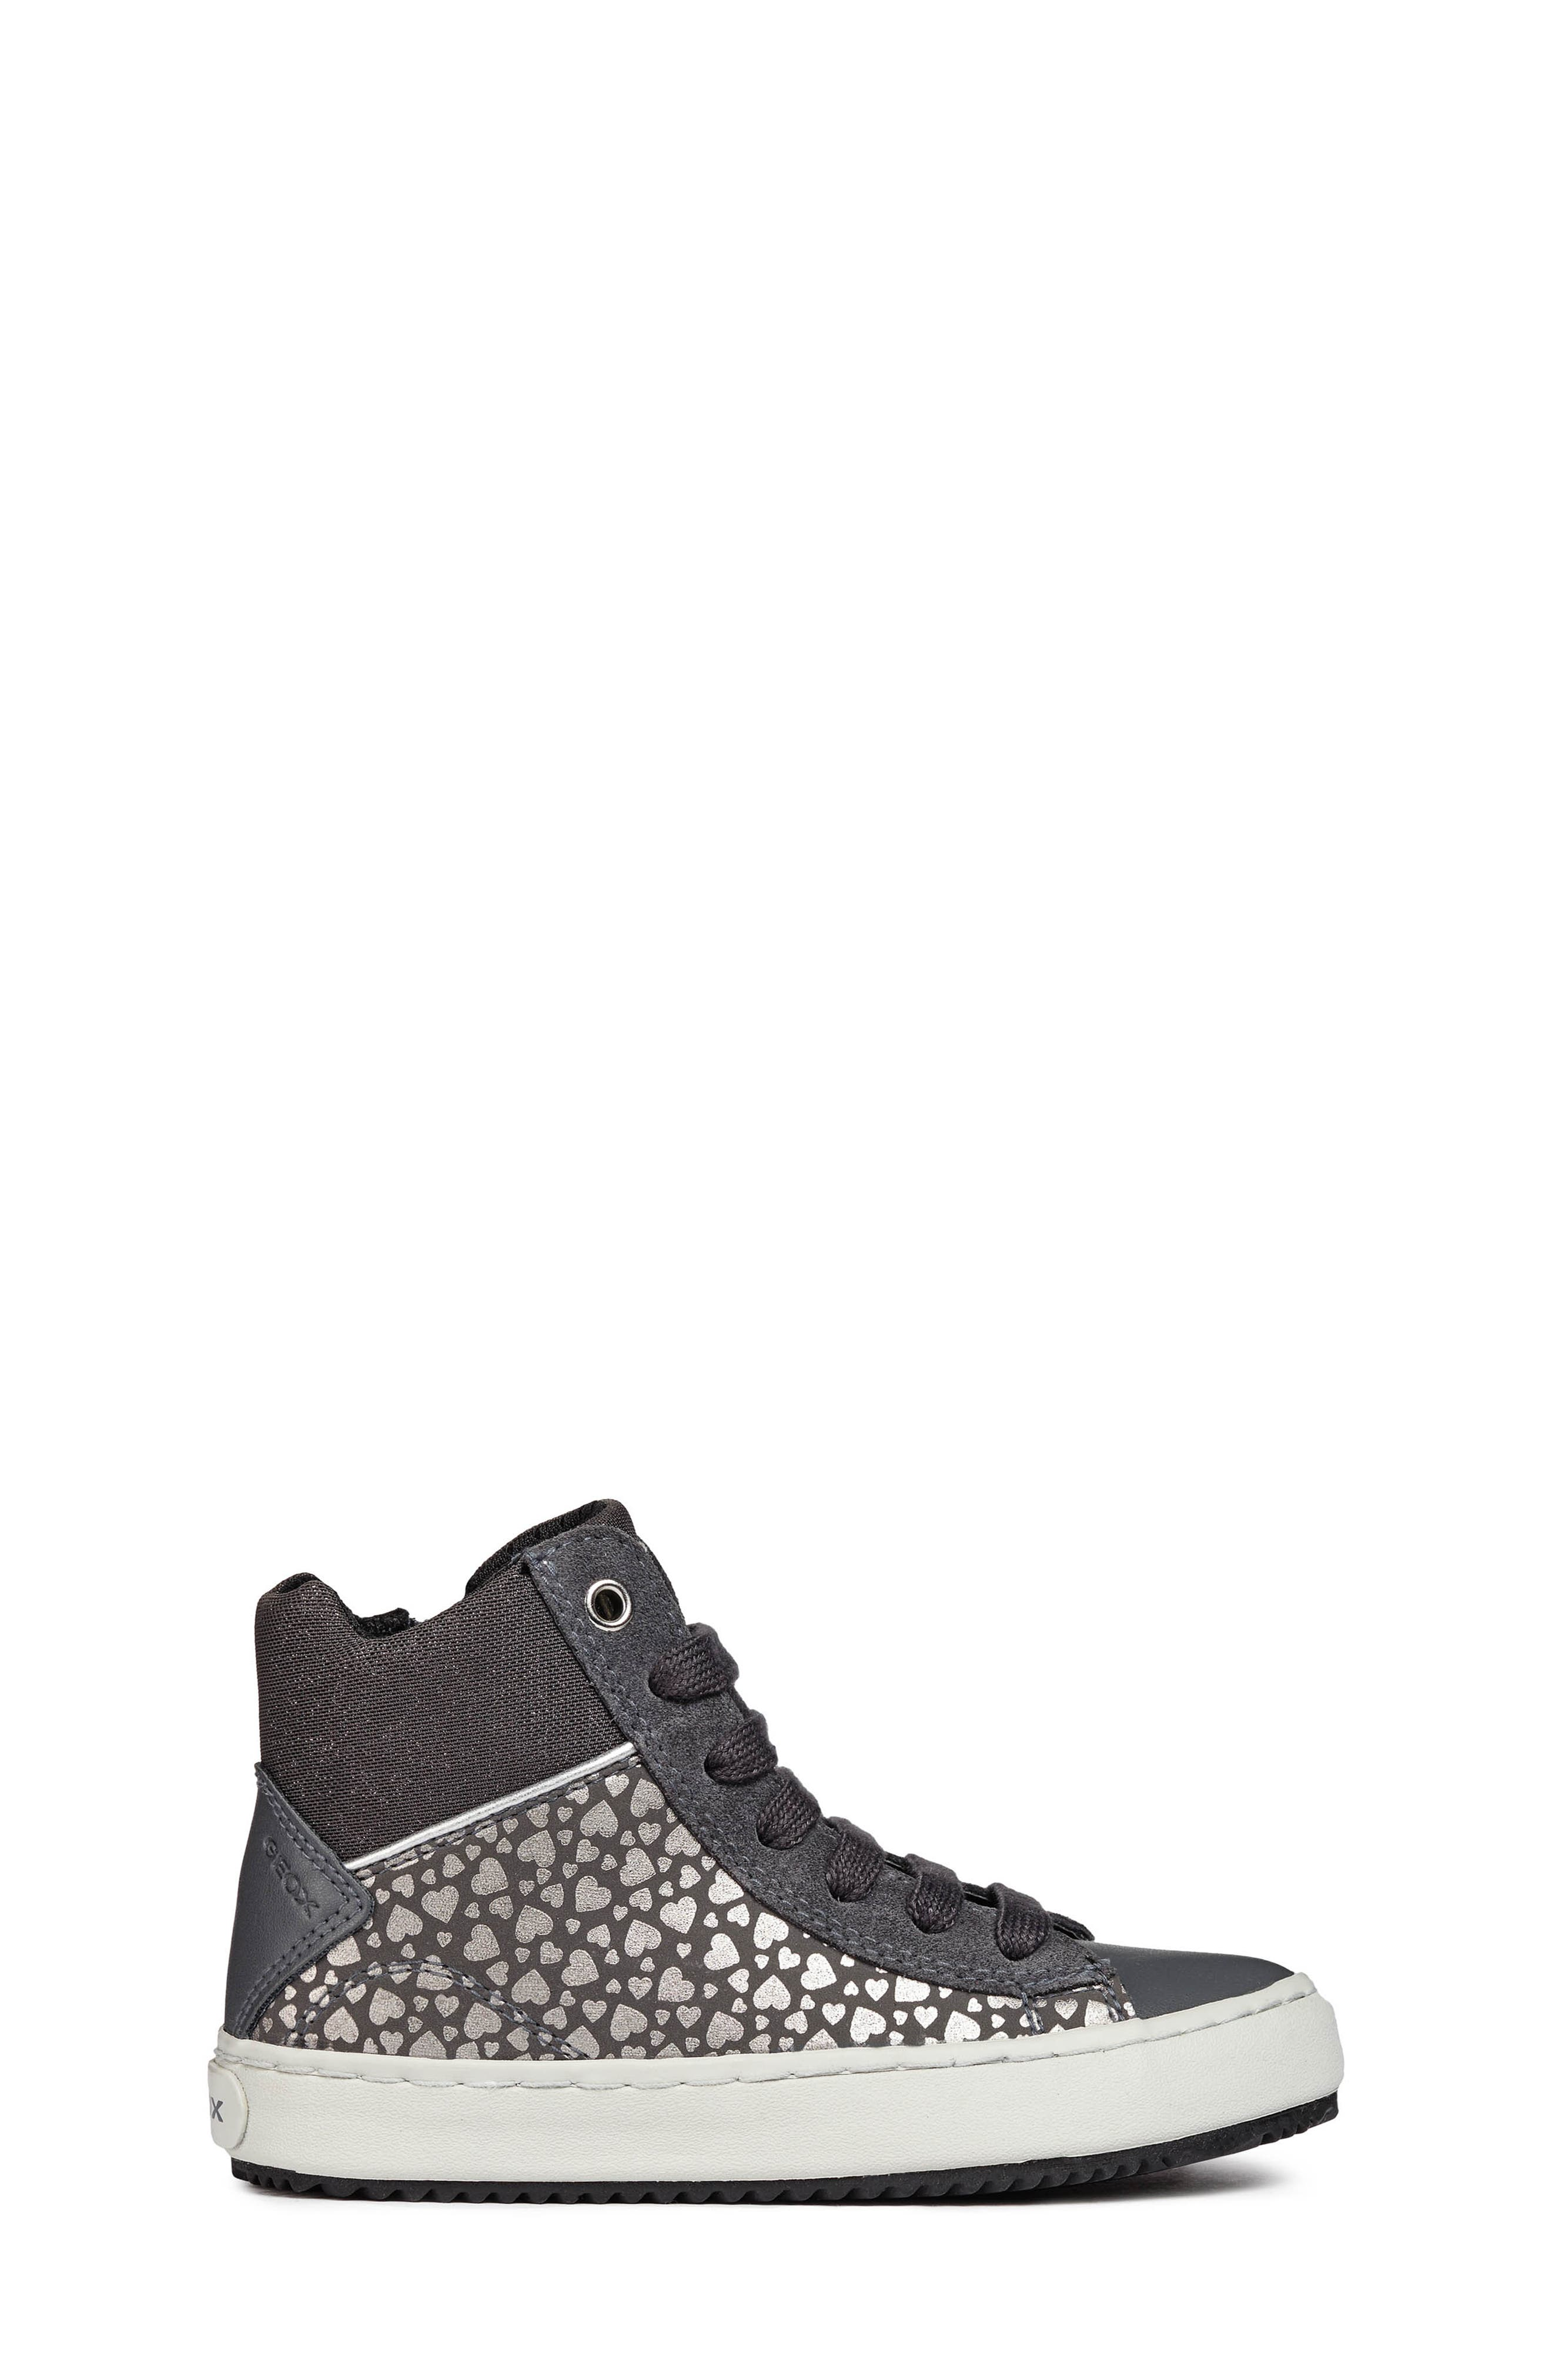 Kalispera High Top Sneaker,                             Alternate thumbnail 3, color,                             DARK GREY